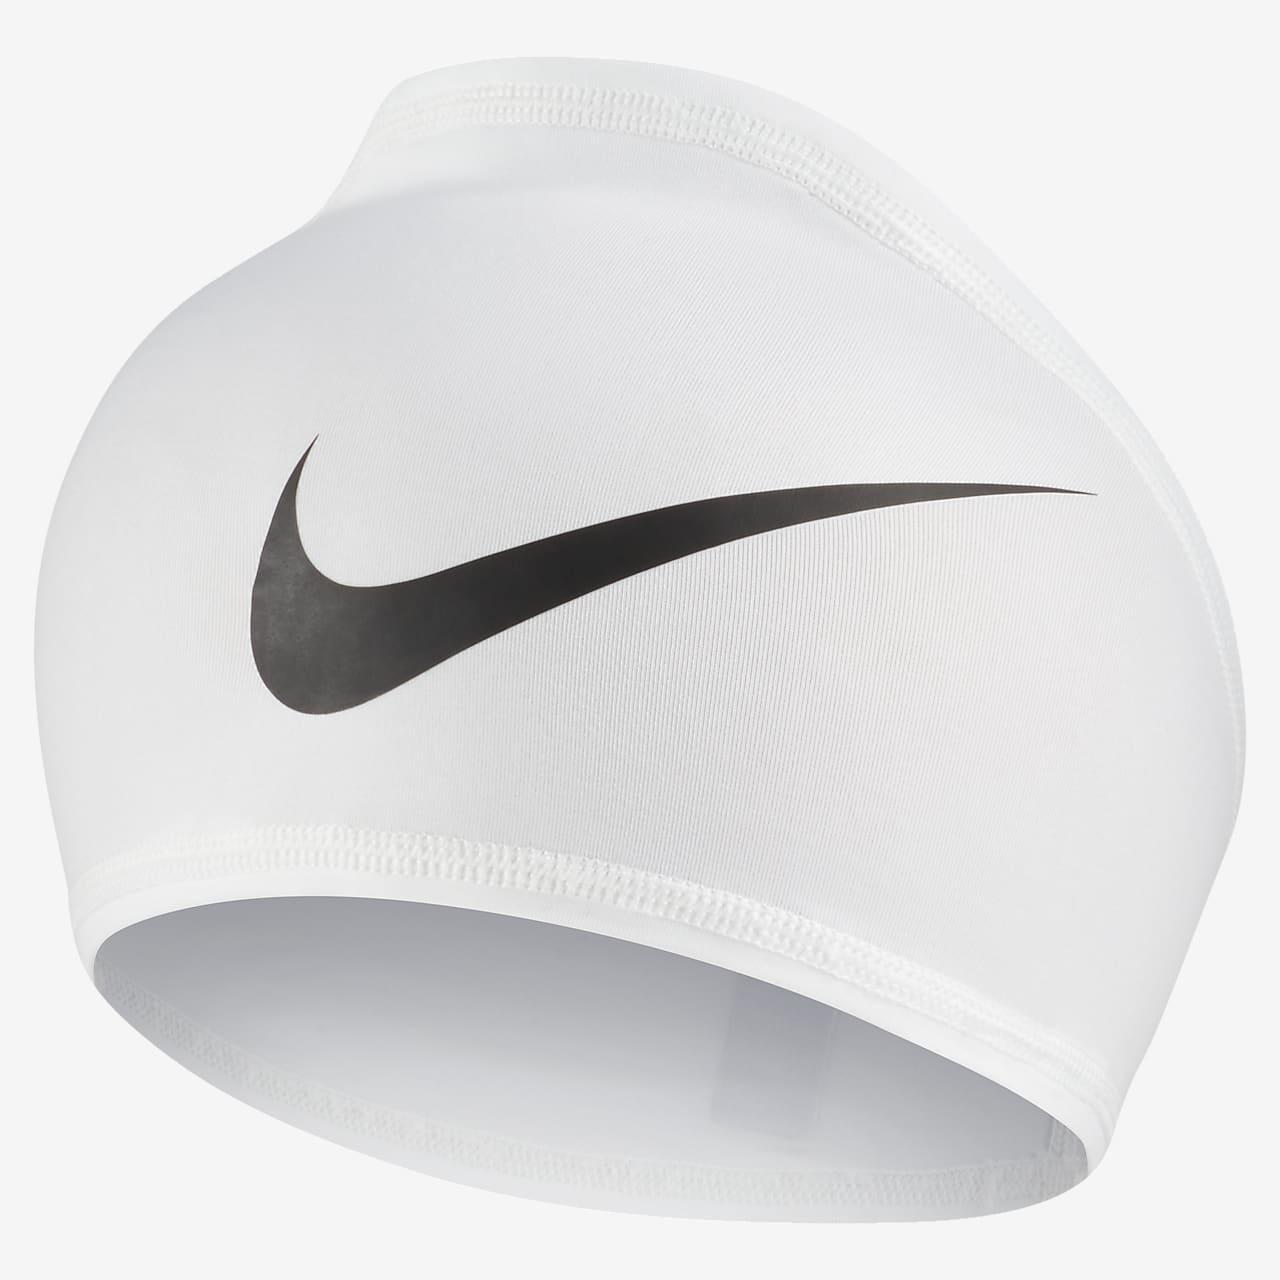 Cubierta para la cabeza Nike Pro Dri-FIT 4.0